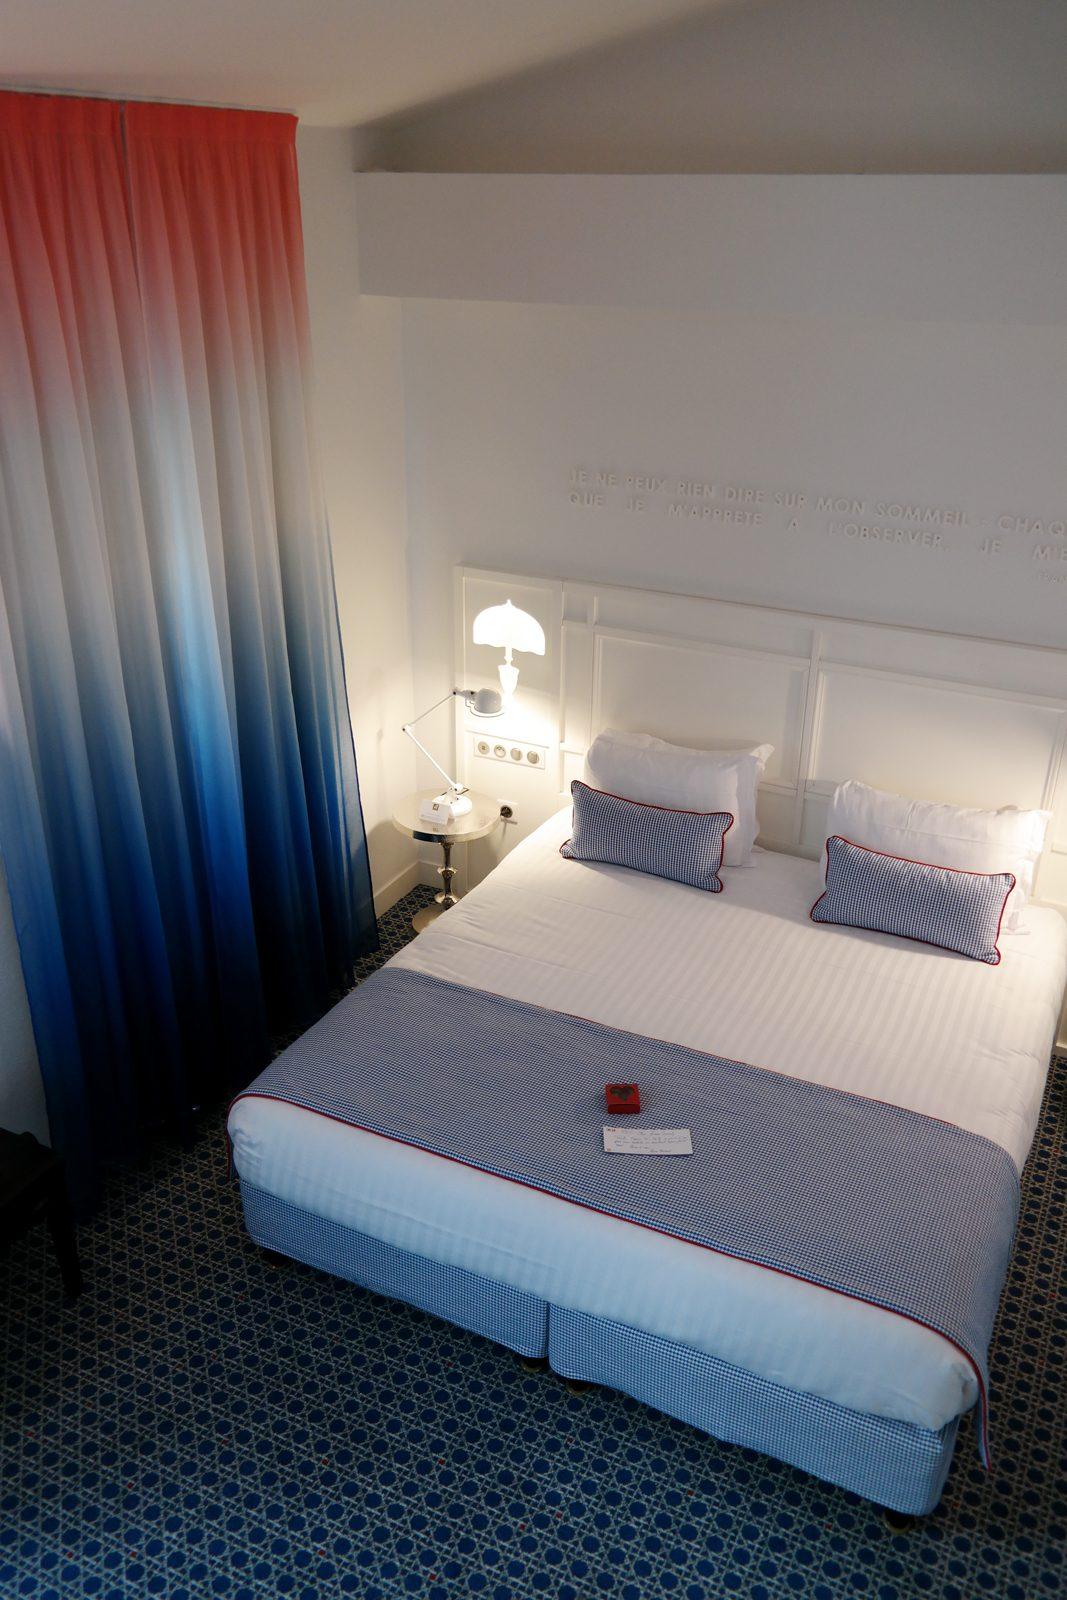 Hotel le 34B astotel paris 34 rue Bergere duplex room king size-bed booking french design tricolor curtain photo usofparis blog